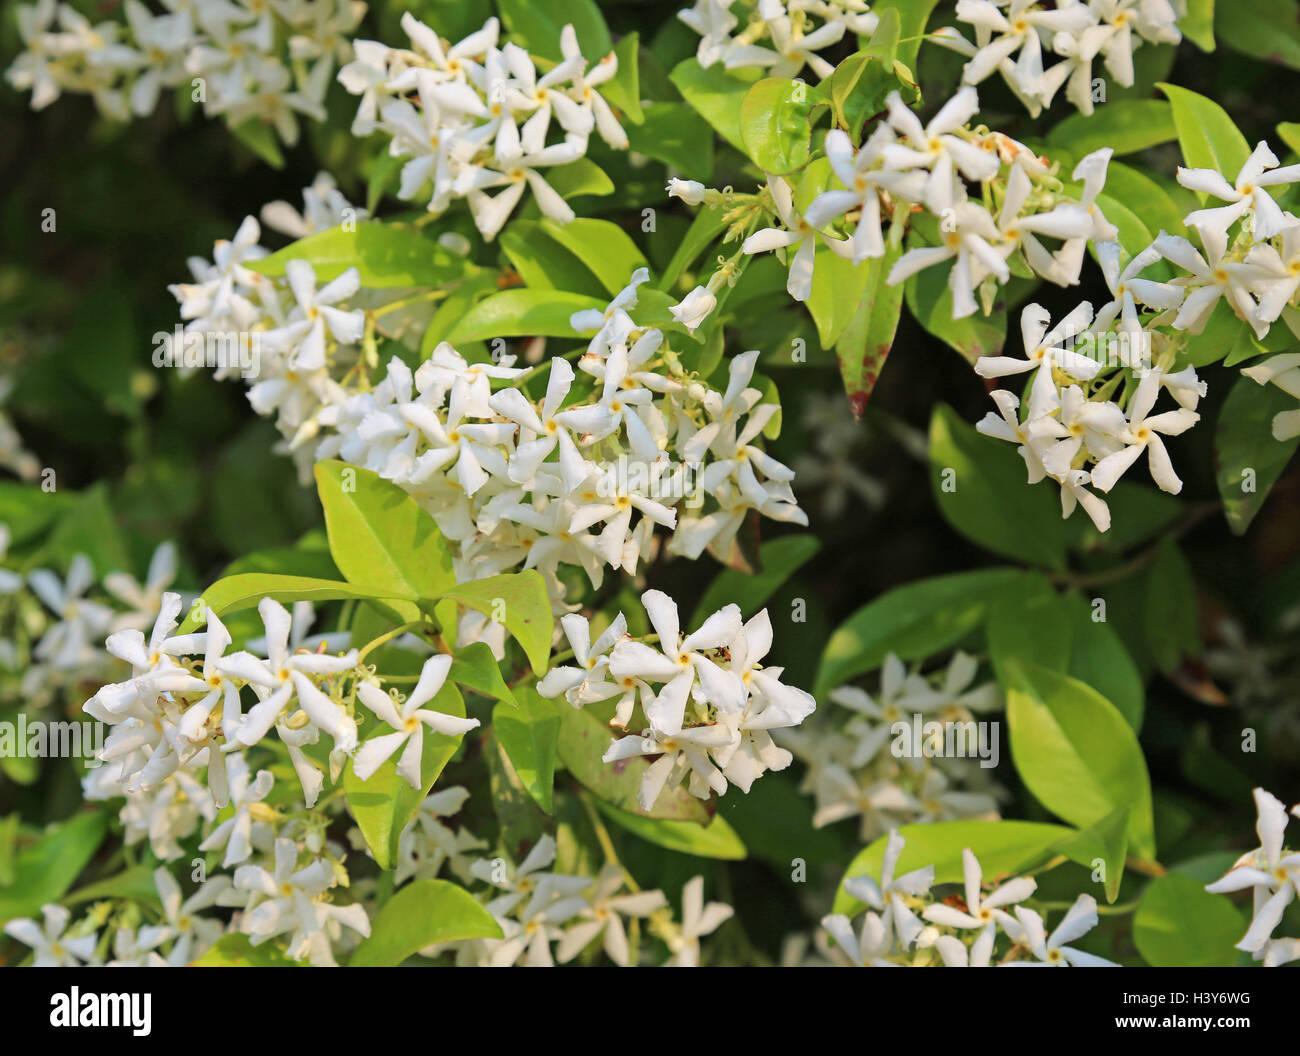 Jasmine very fragrant white flowers in spring stock photo 122914668 jasmine very fragrant white flowers in spring mightylinksfo